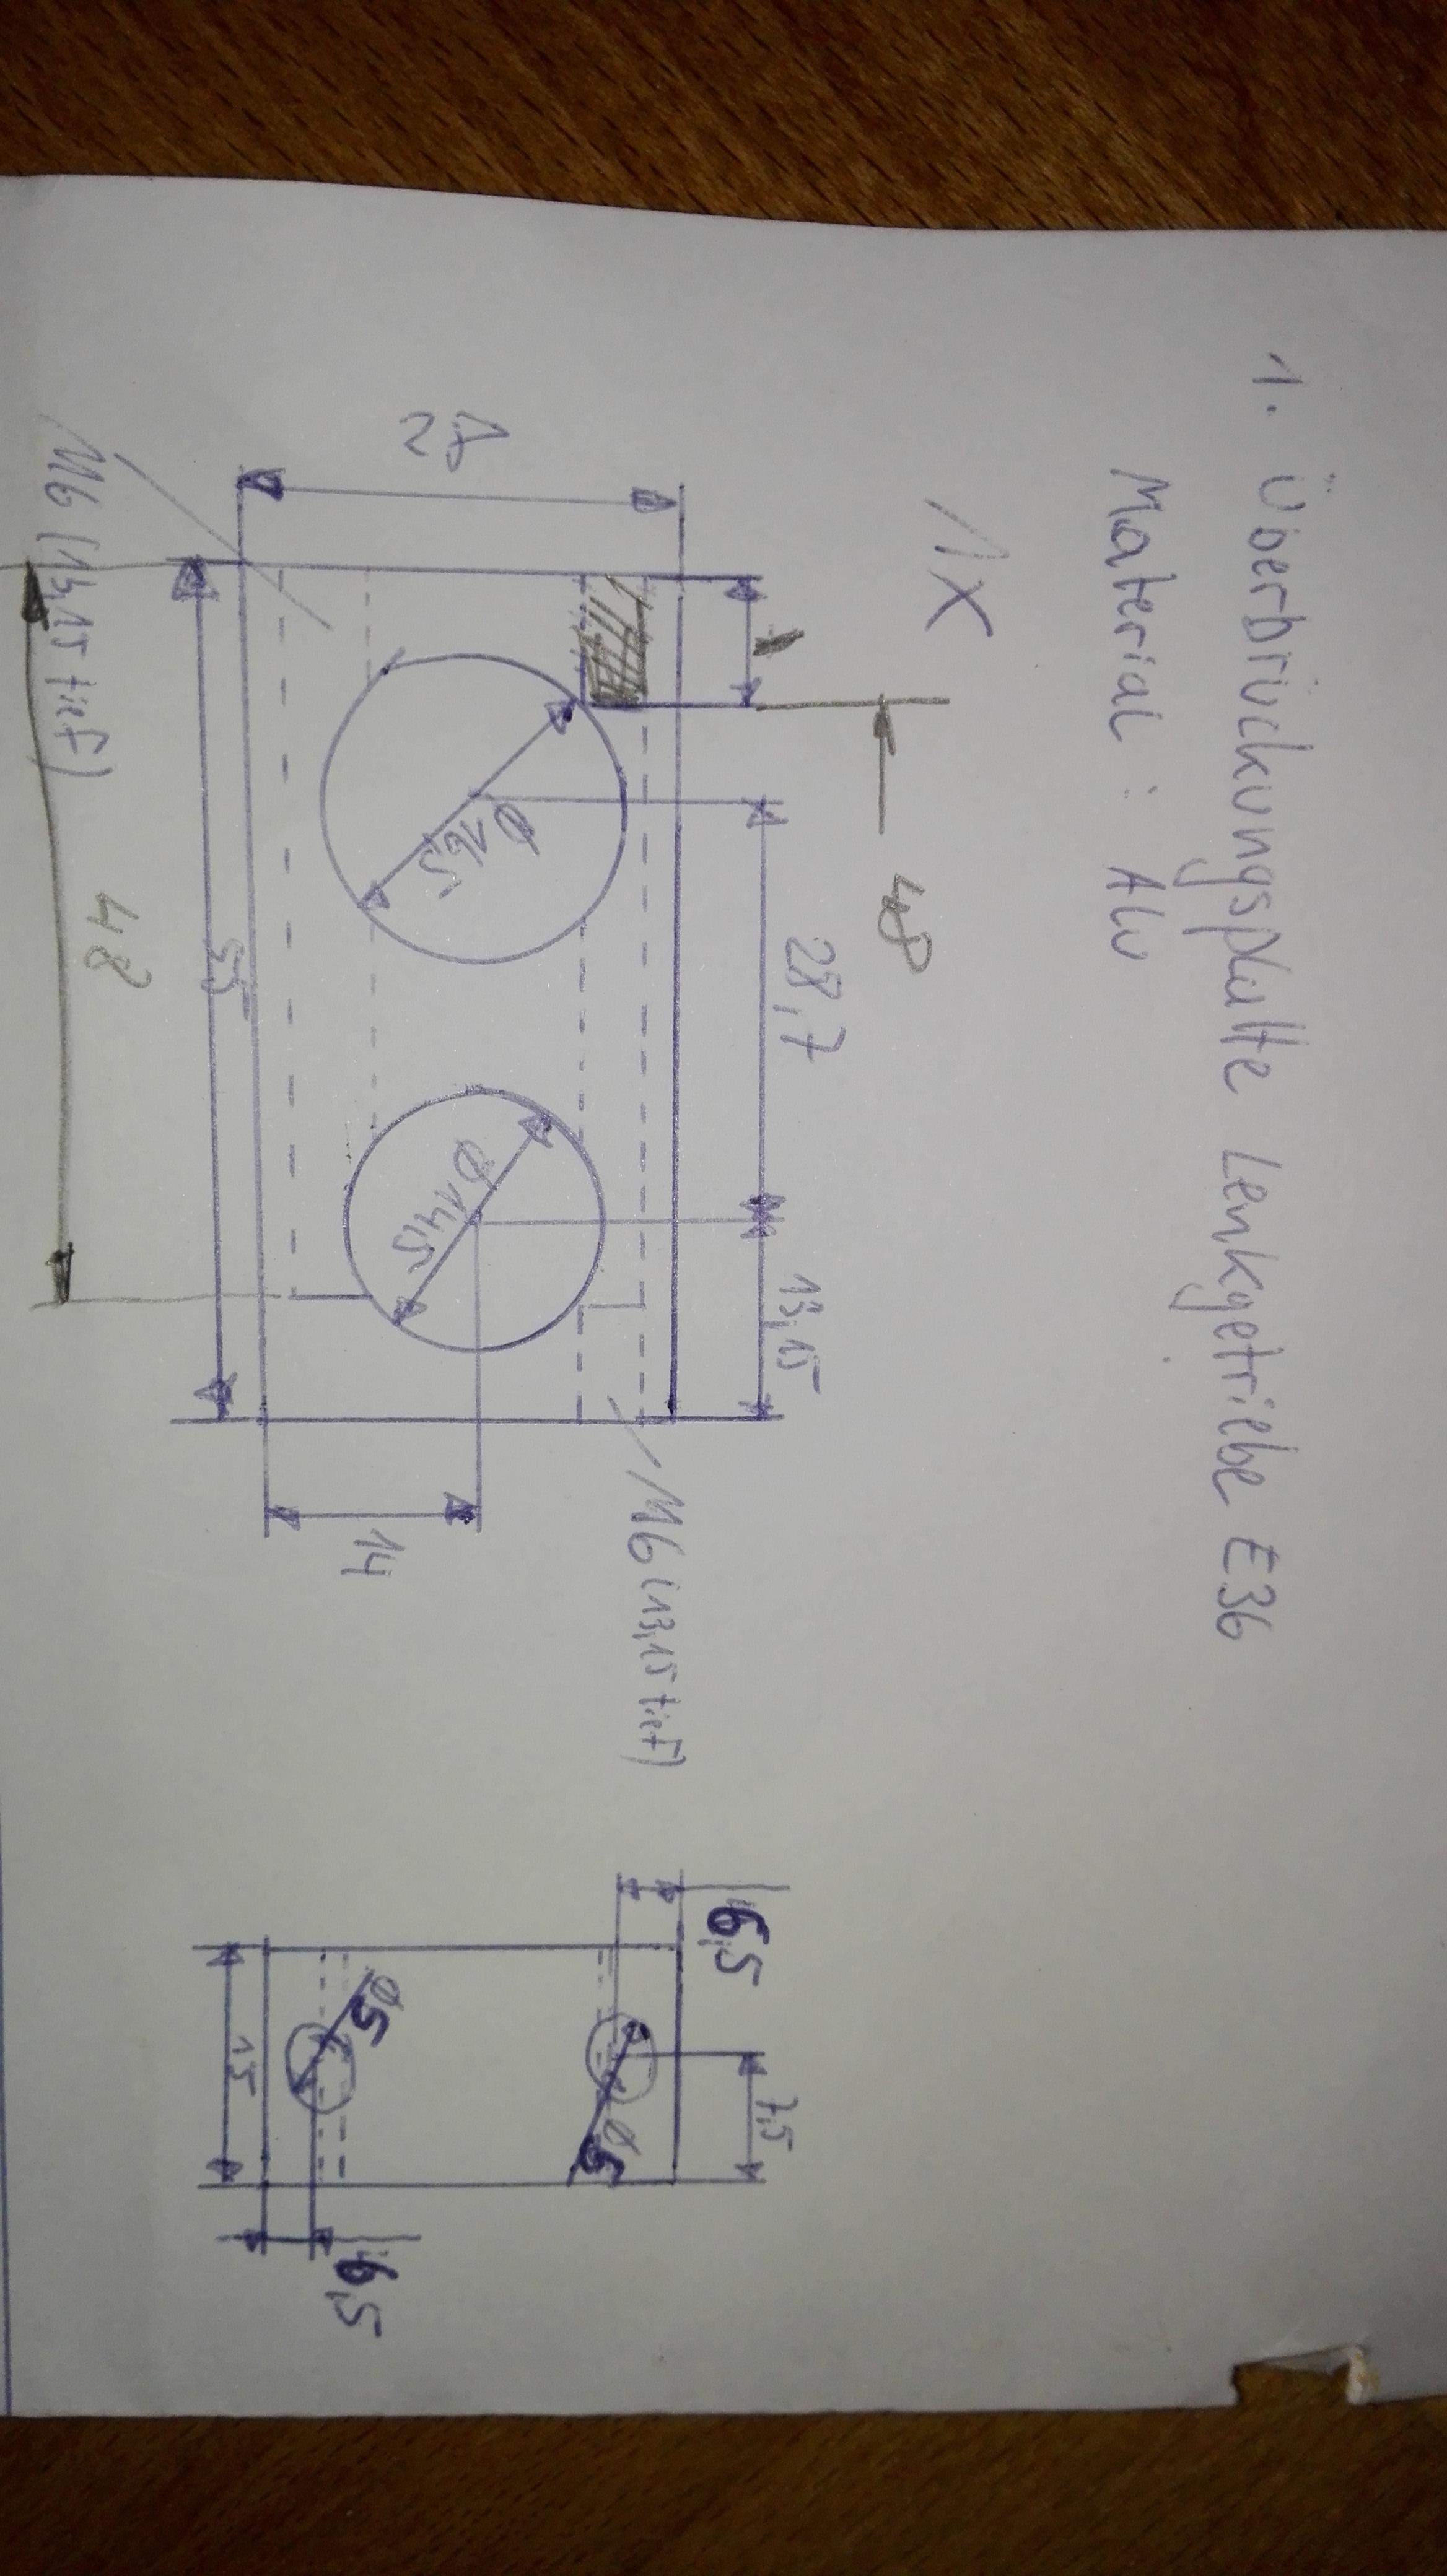 e36 46 lenkgetriebe ohne servo seite 2 fahrwerk e30. Black Bedroom Furniture Sets. Home Design Ideas